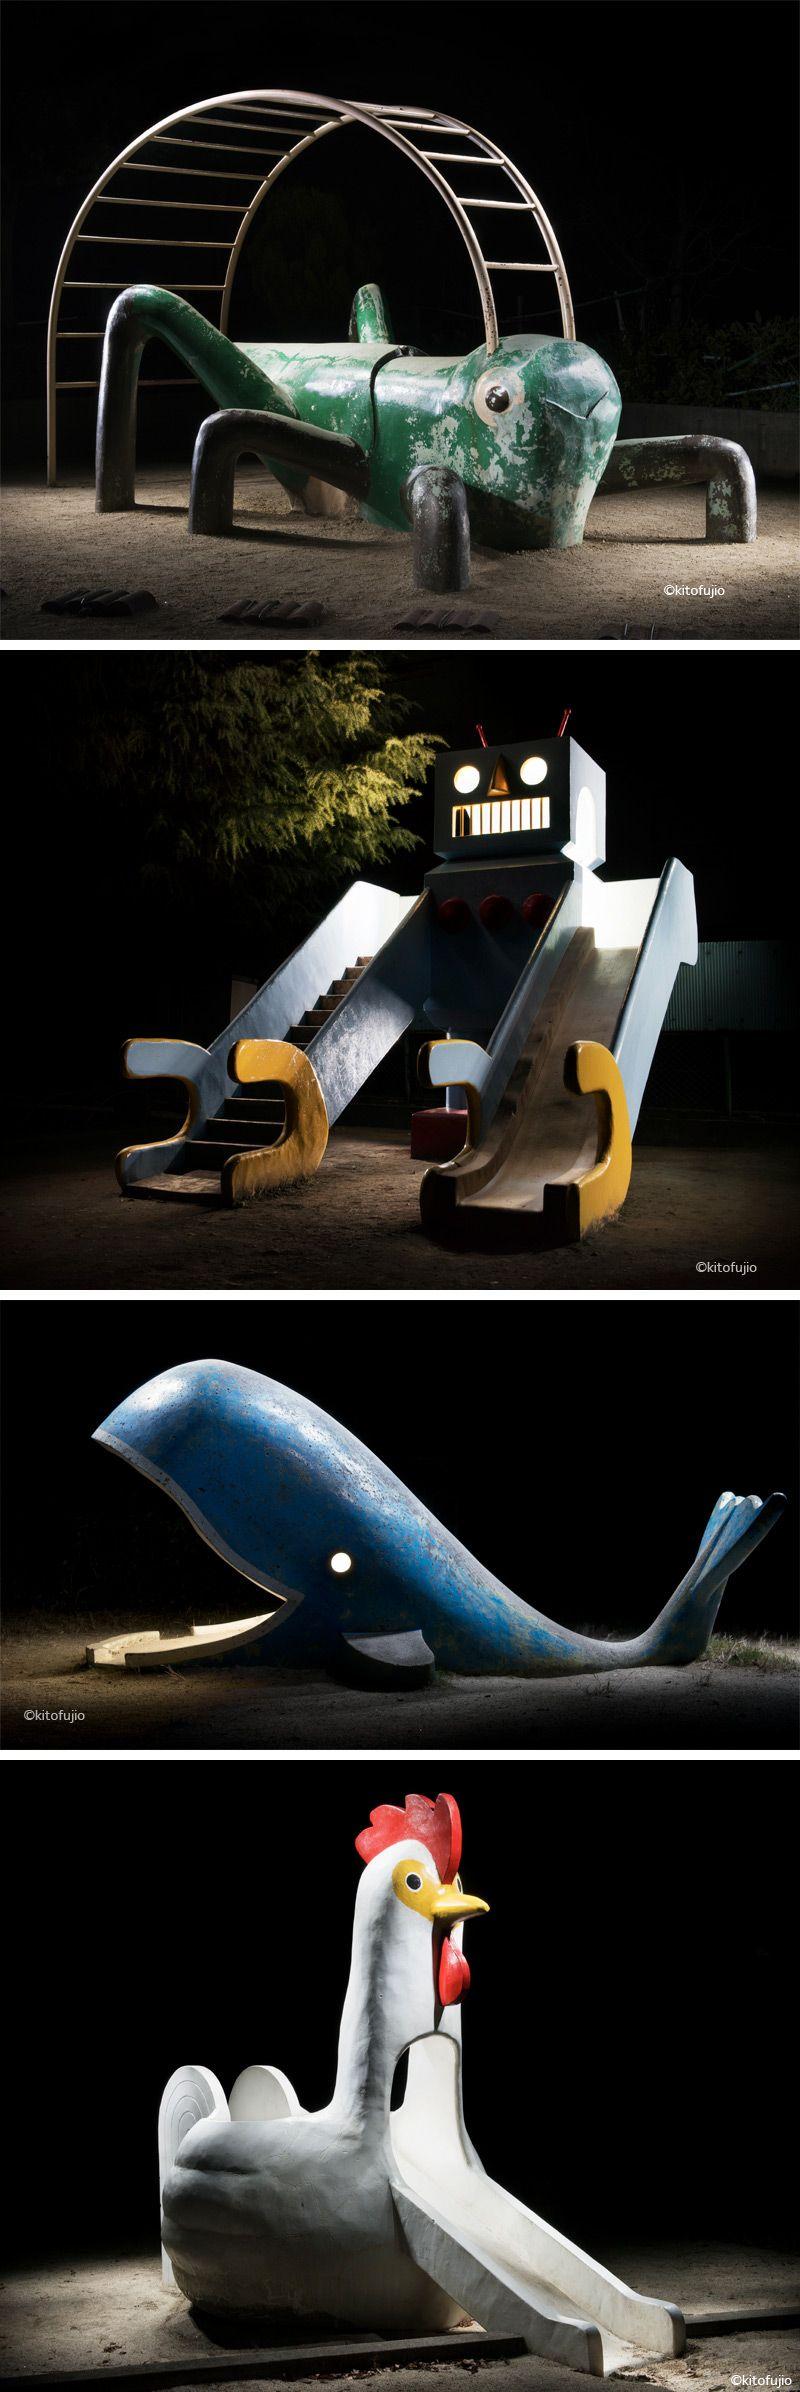 Photos of Japanese Playground Equipment at Night by Kito